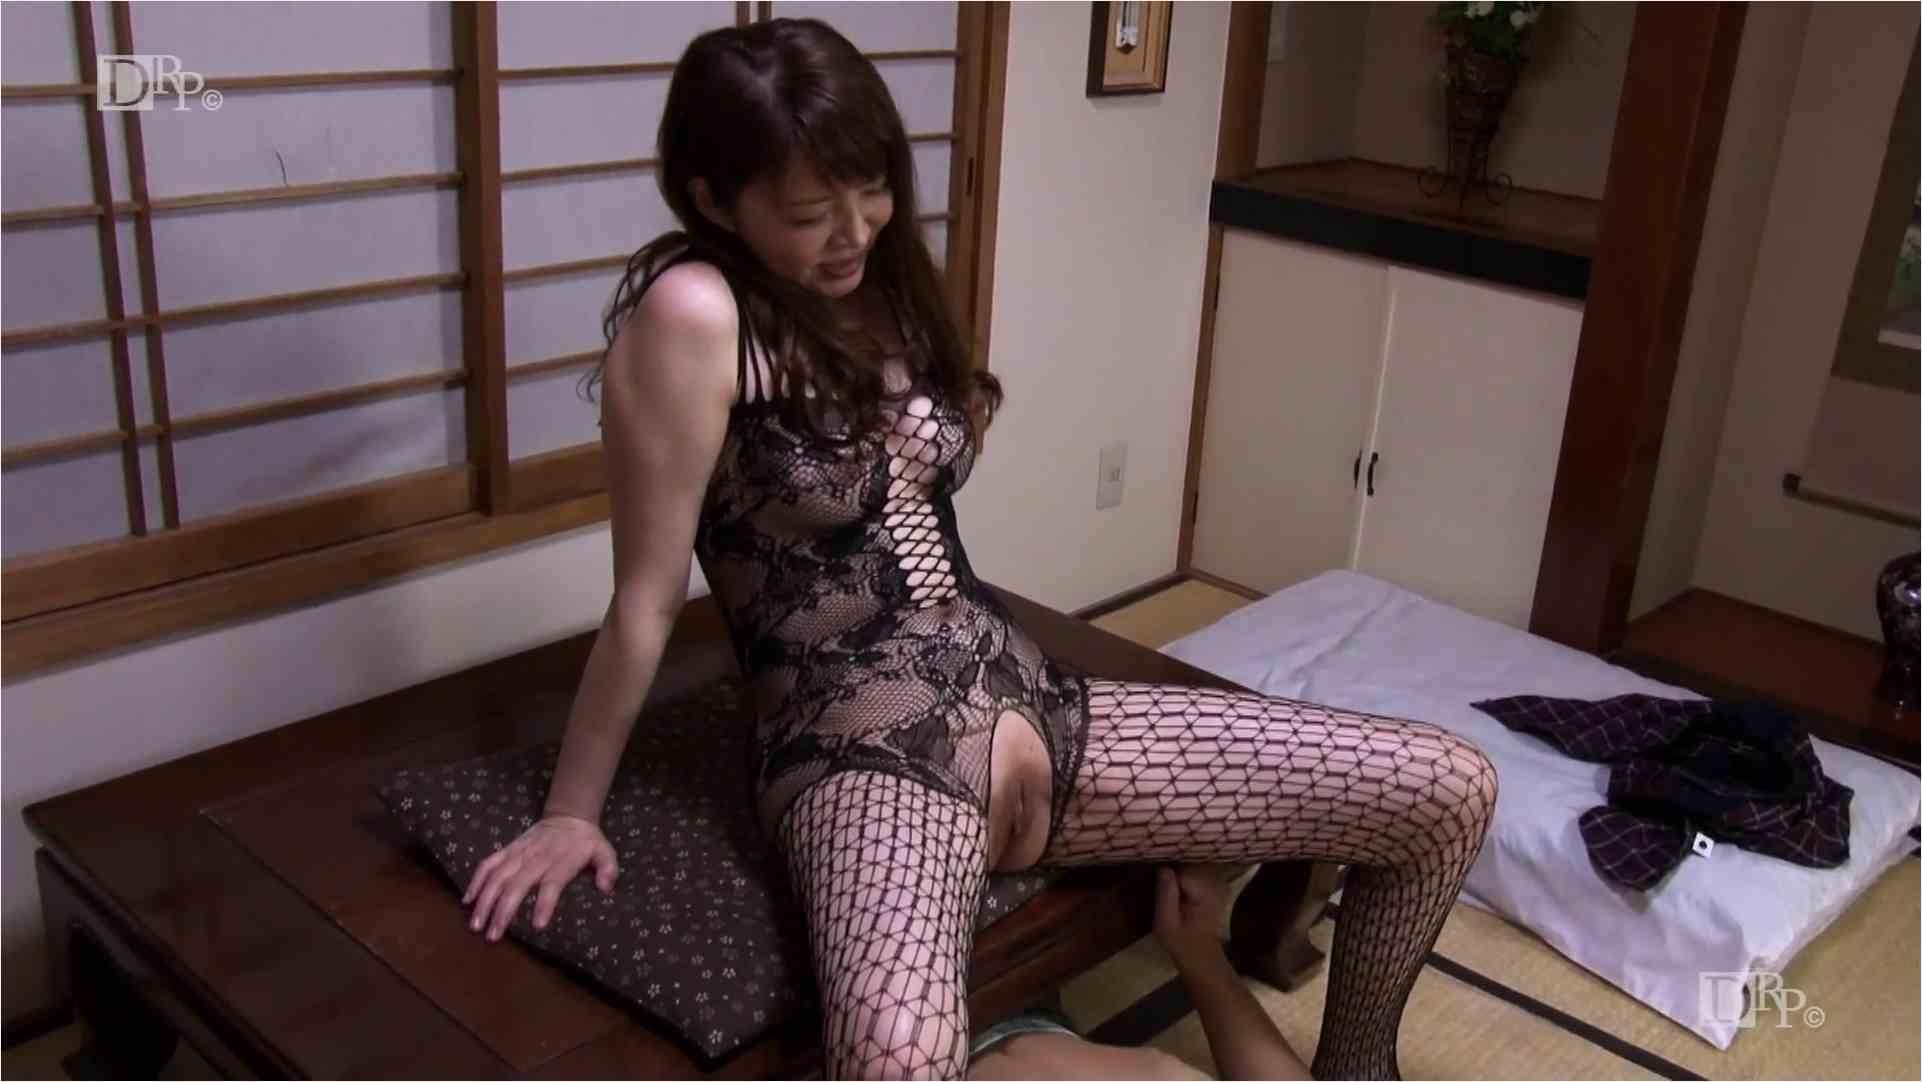 Heyzo-1557-痴女奥様?りりかがイク!~卑猥な下着で男を誘惑~